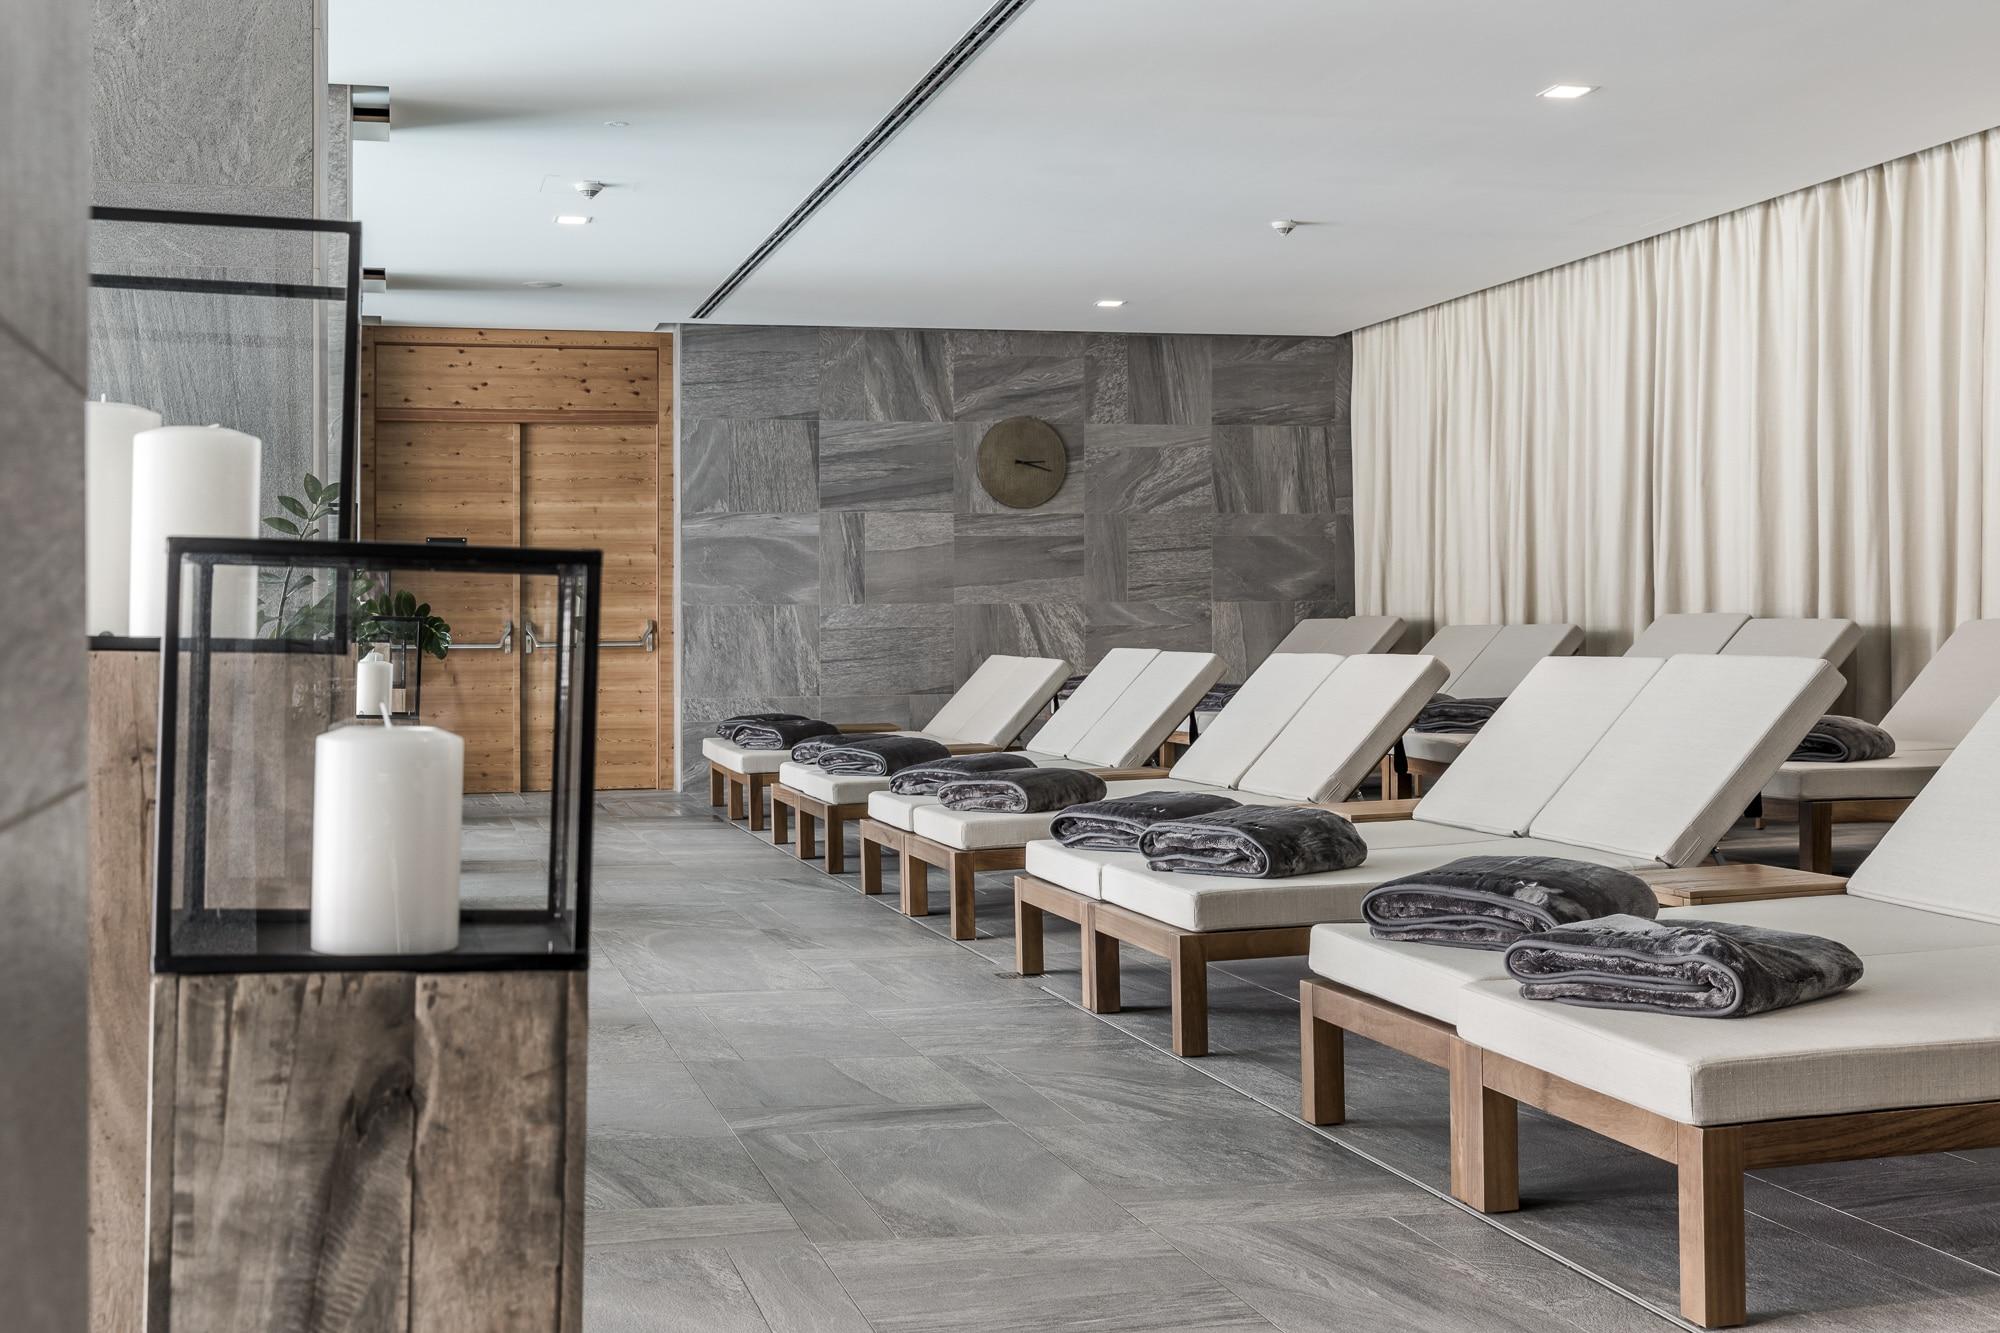 NIDUM Casual Luxury Hotel